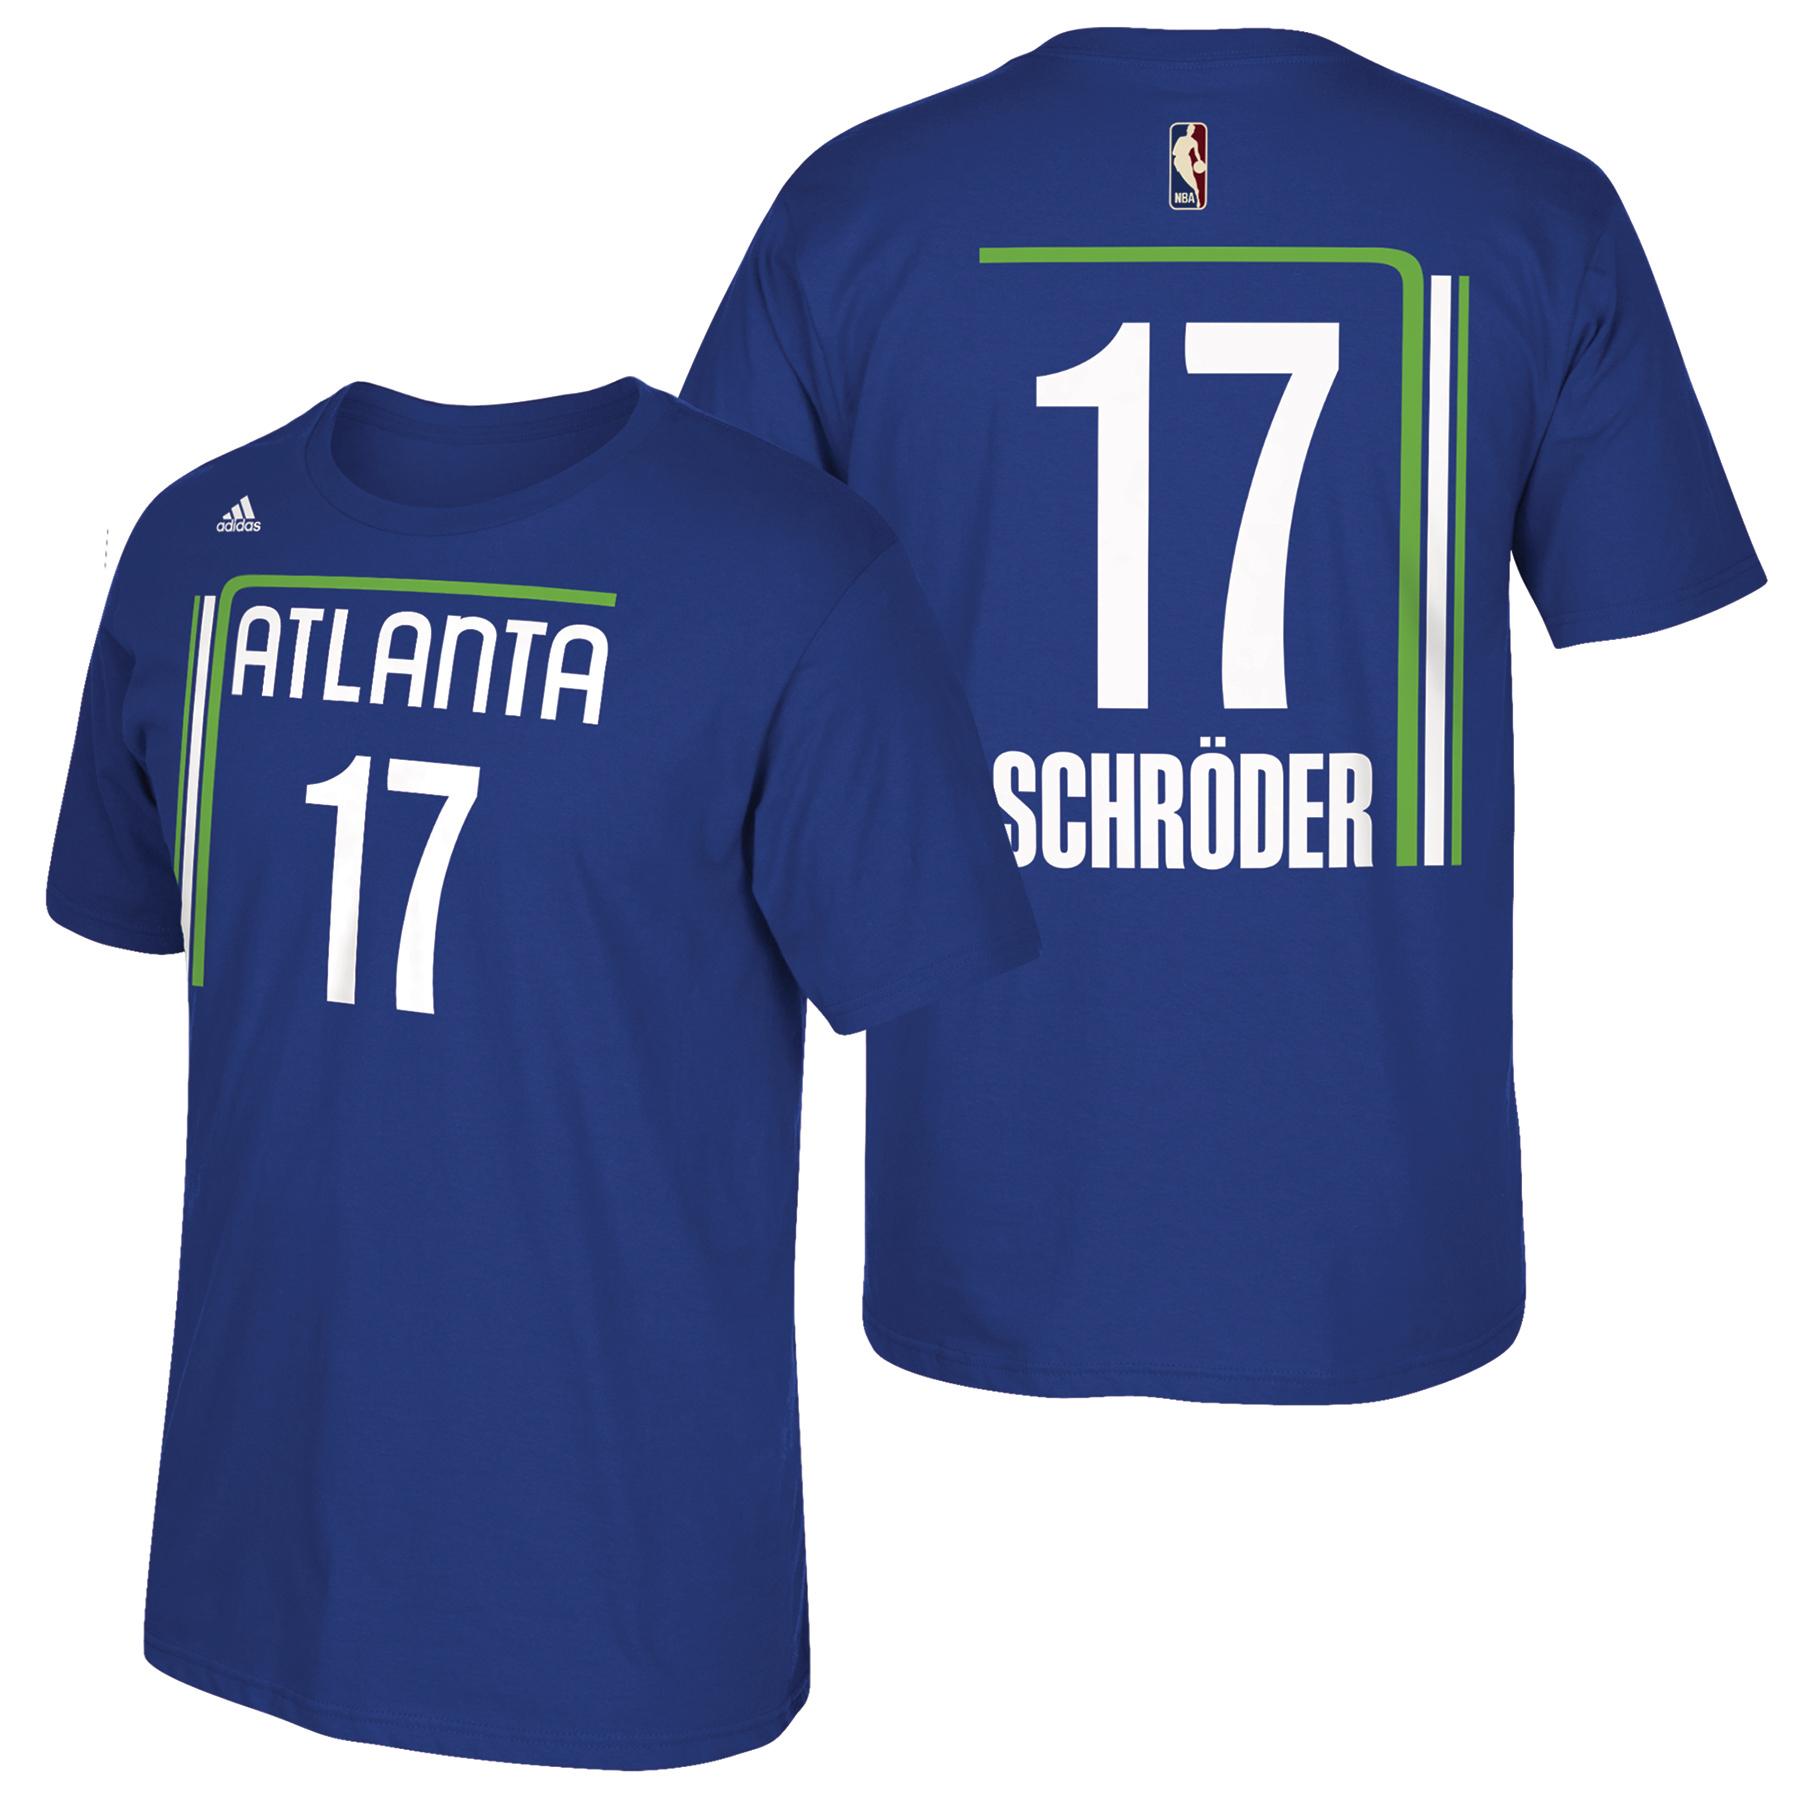 Atlanta Hawks adidas Hardwood Classics Nights Name & Number T-Shirt -